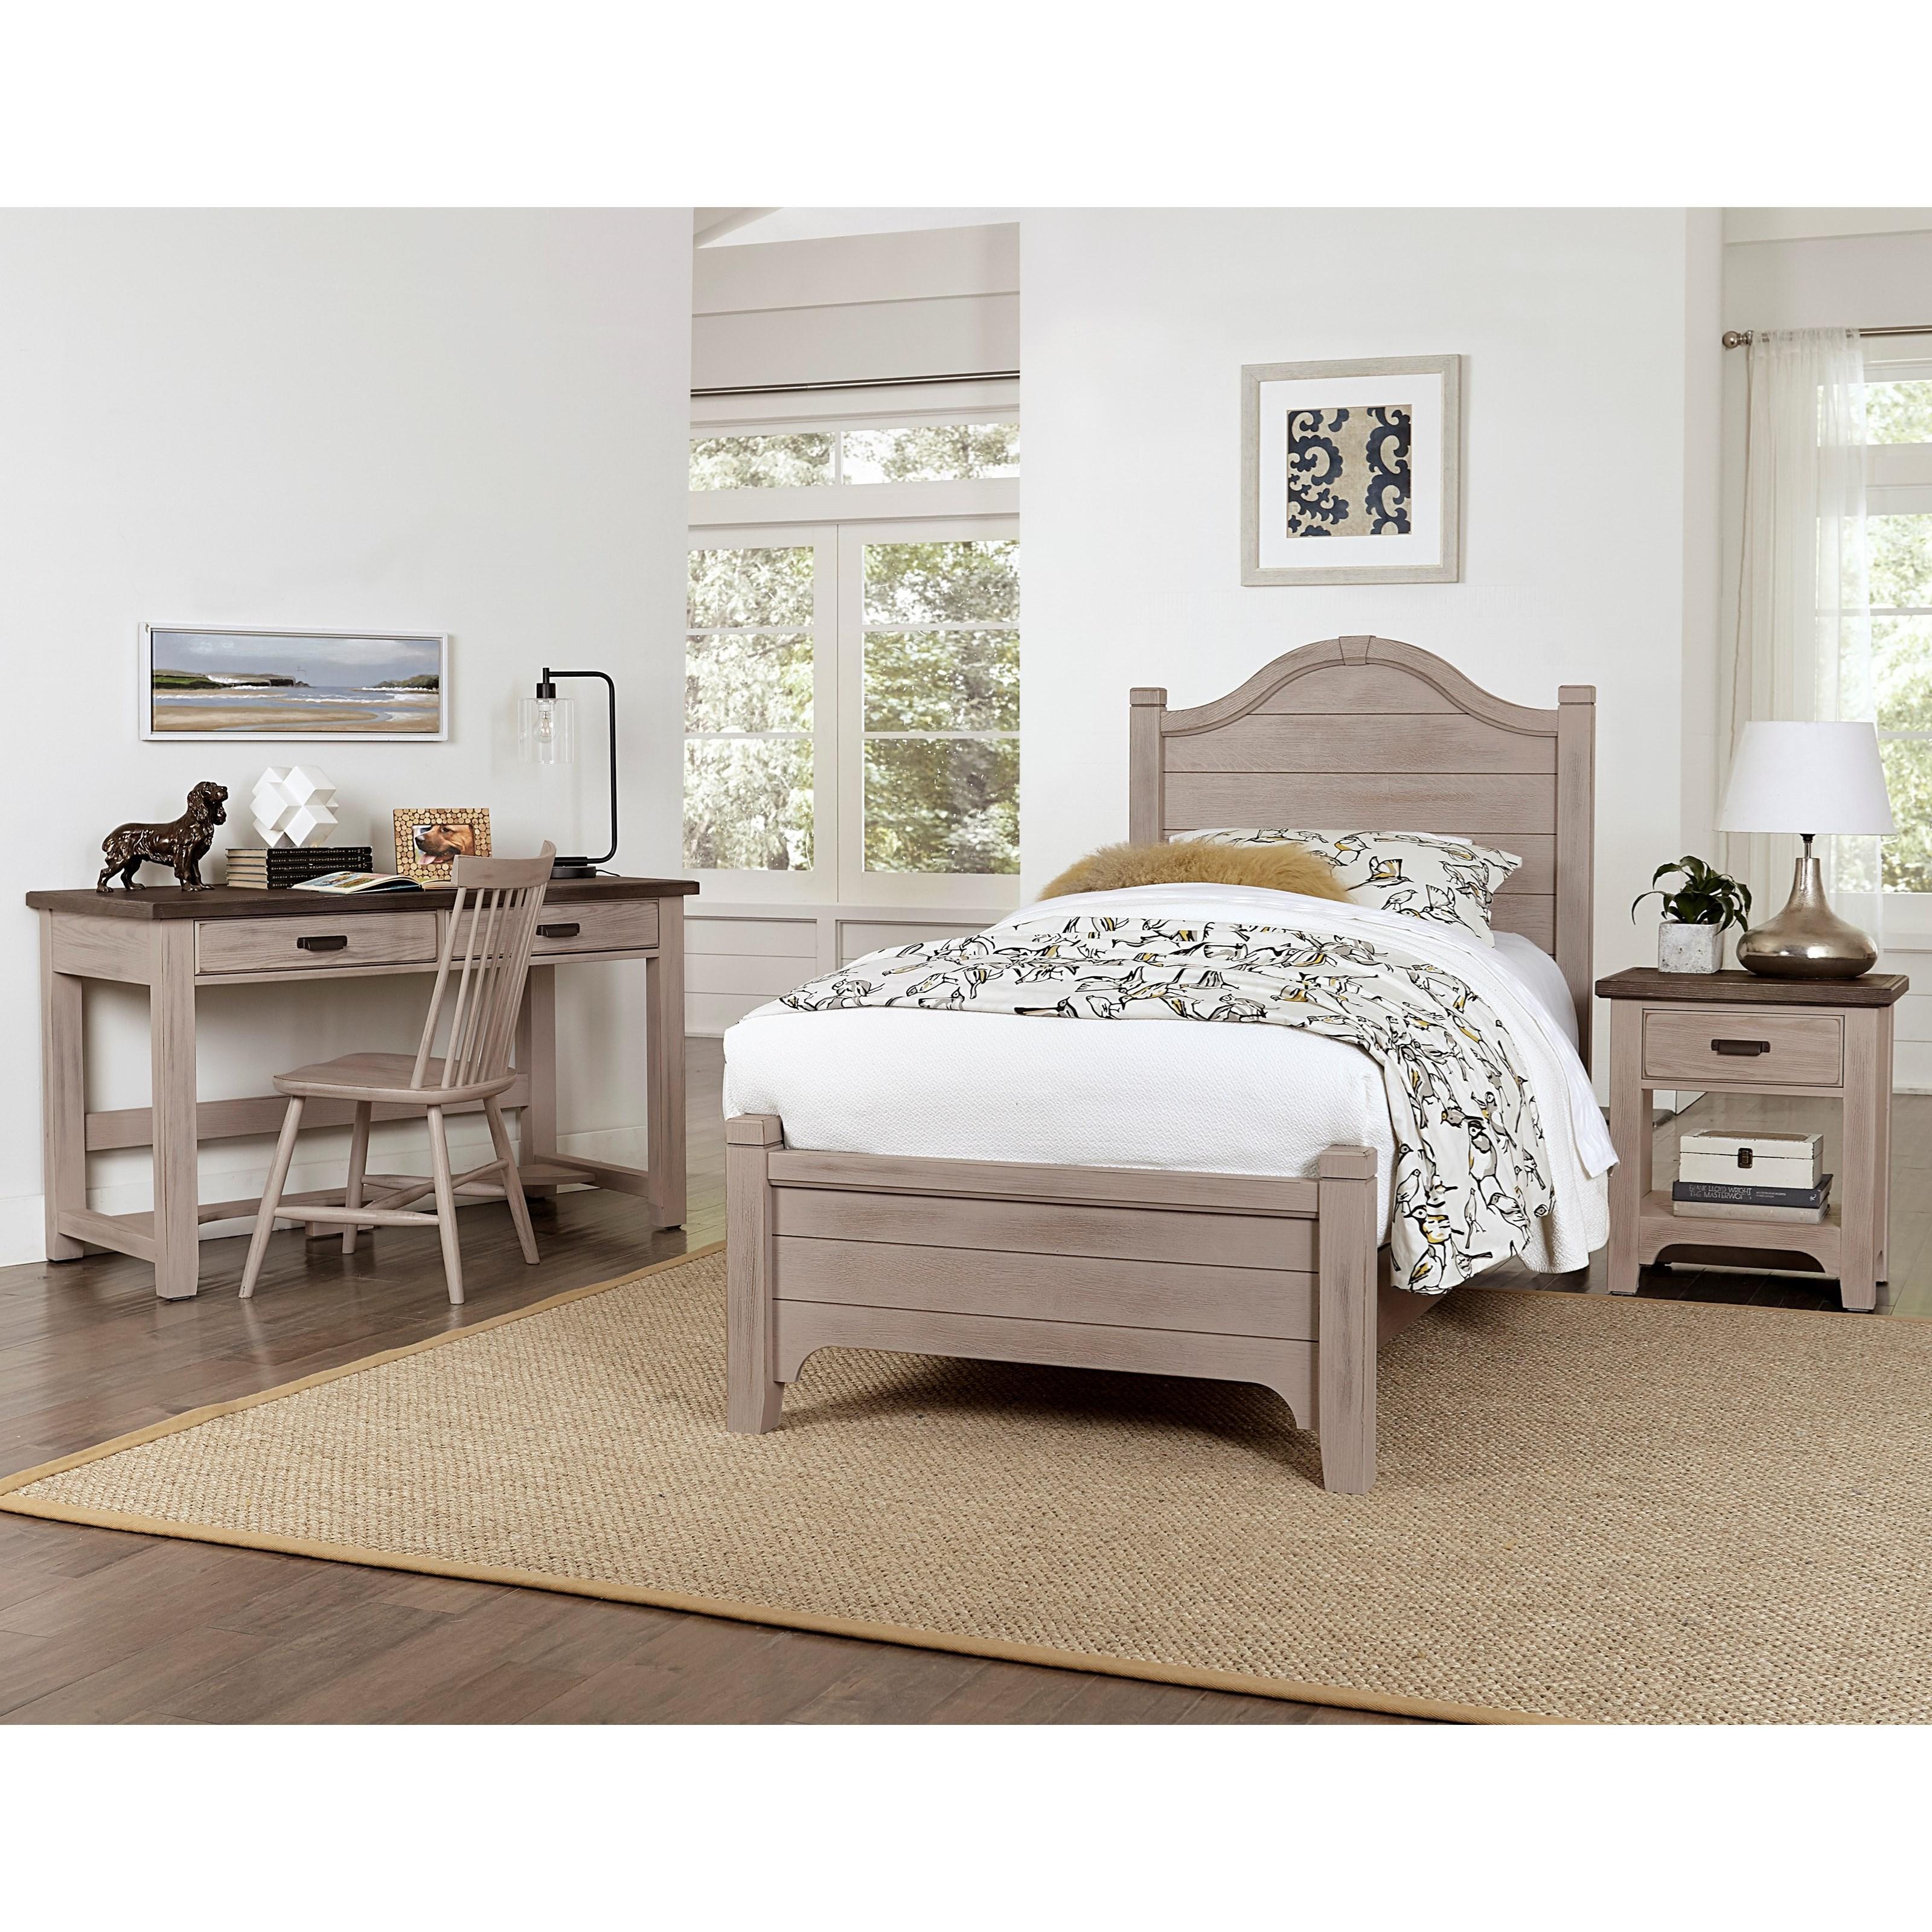 Bungalow Full Bedroom Group by Laurel Mercantile Co. at Belfort Furniture